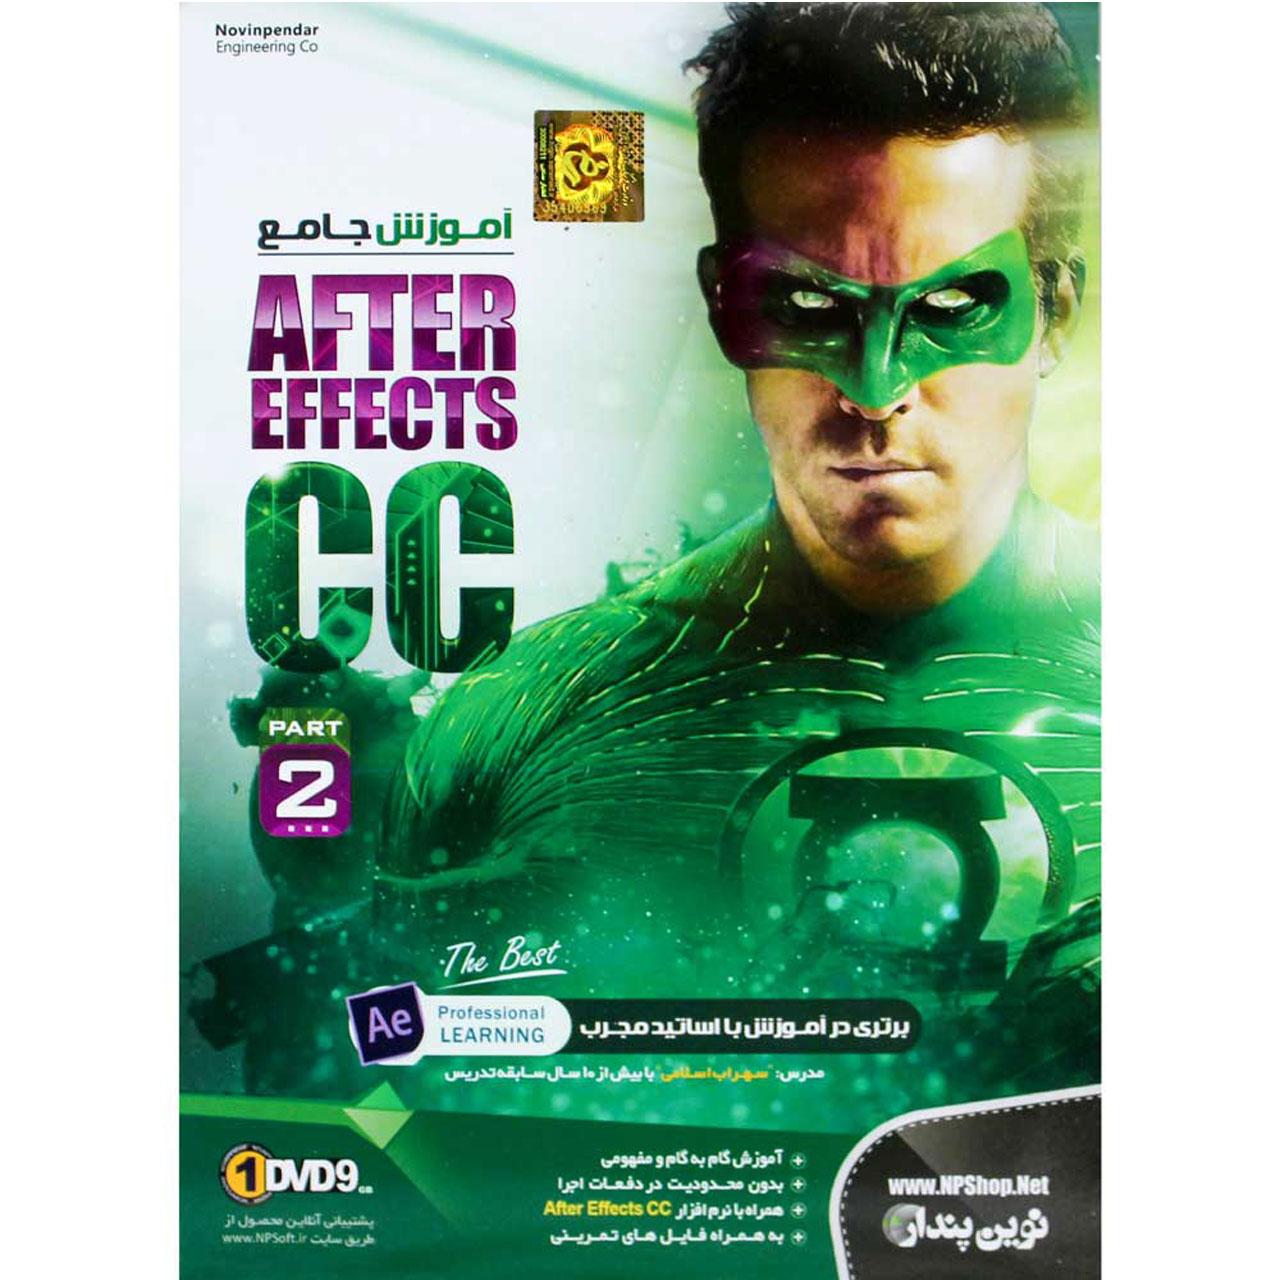 آموزش جامع After Effects CC Part 2 نشر نوین پندار